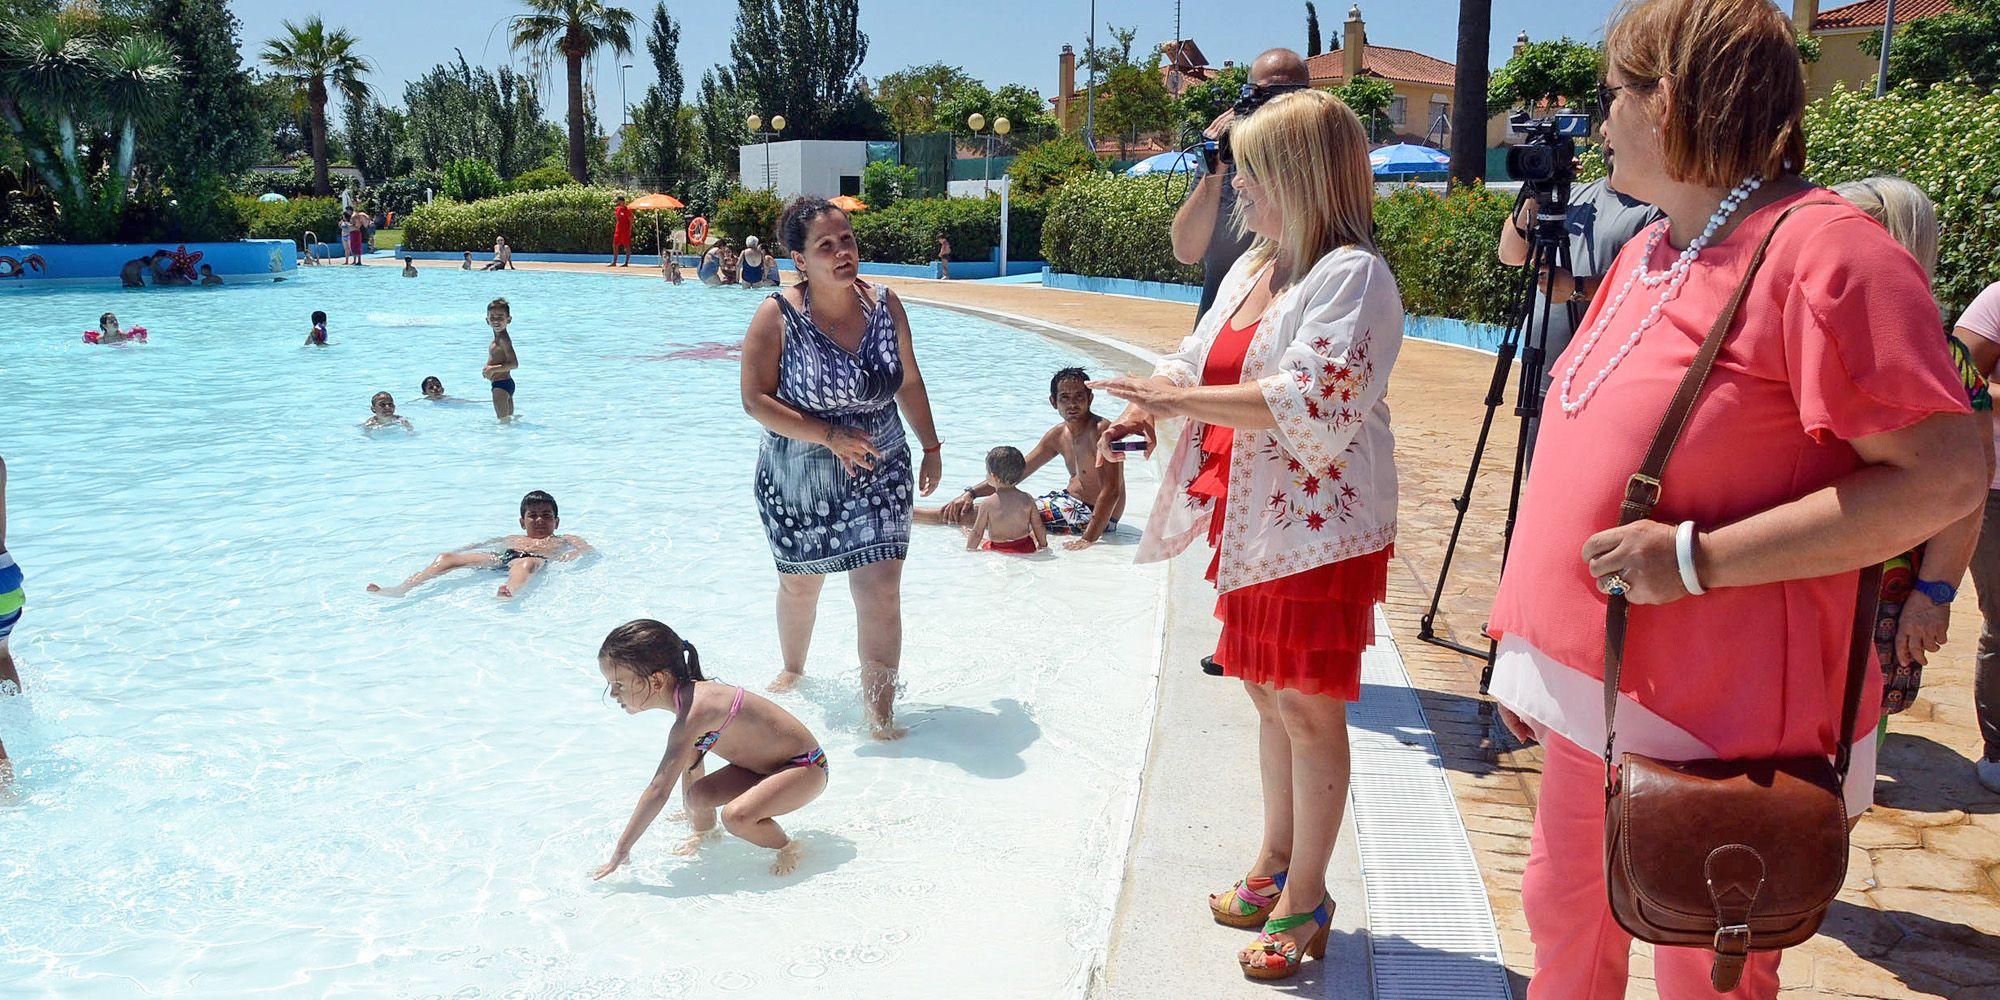 La alcaldesa de Jerez, Mamen Sánchez, inaugurando la temporada de verano en Piscinas Jerez   Mira Jerez